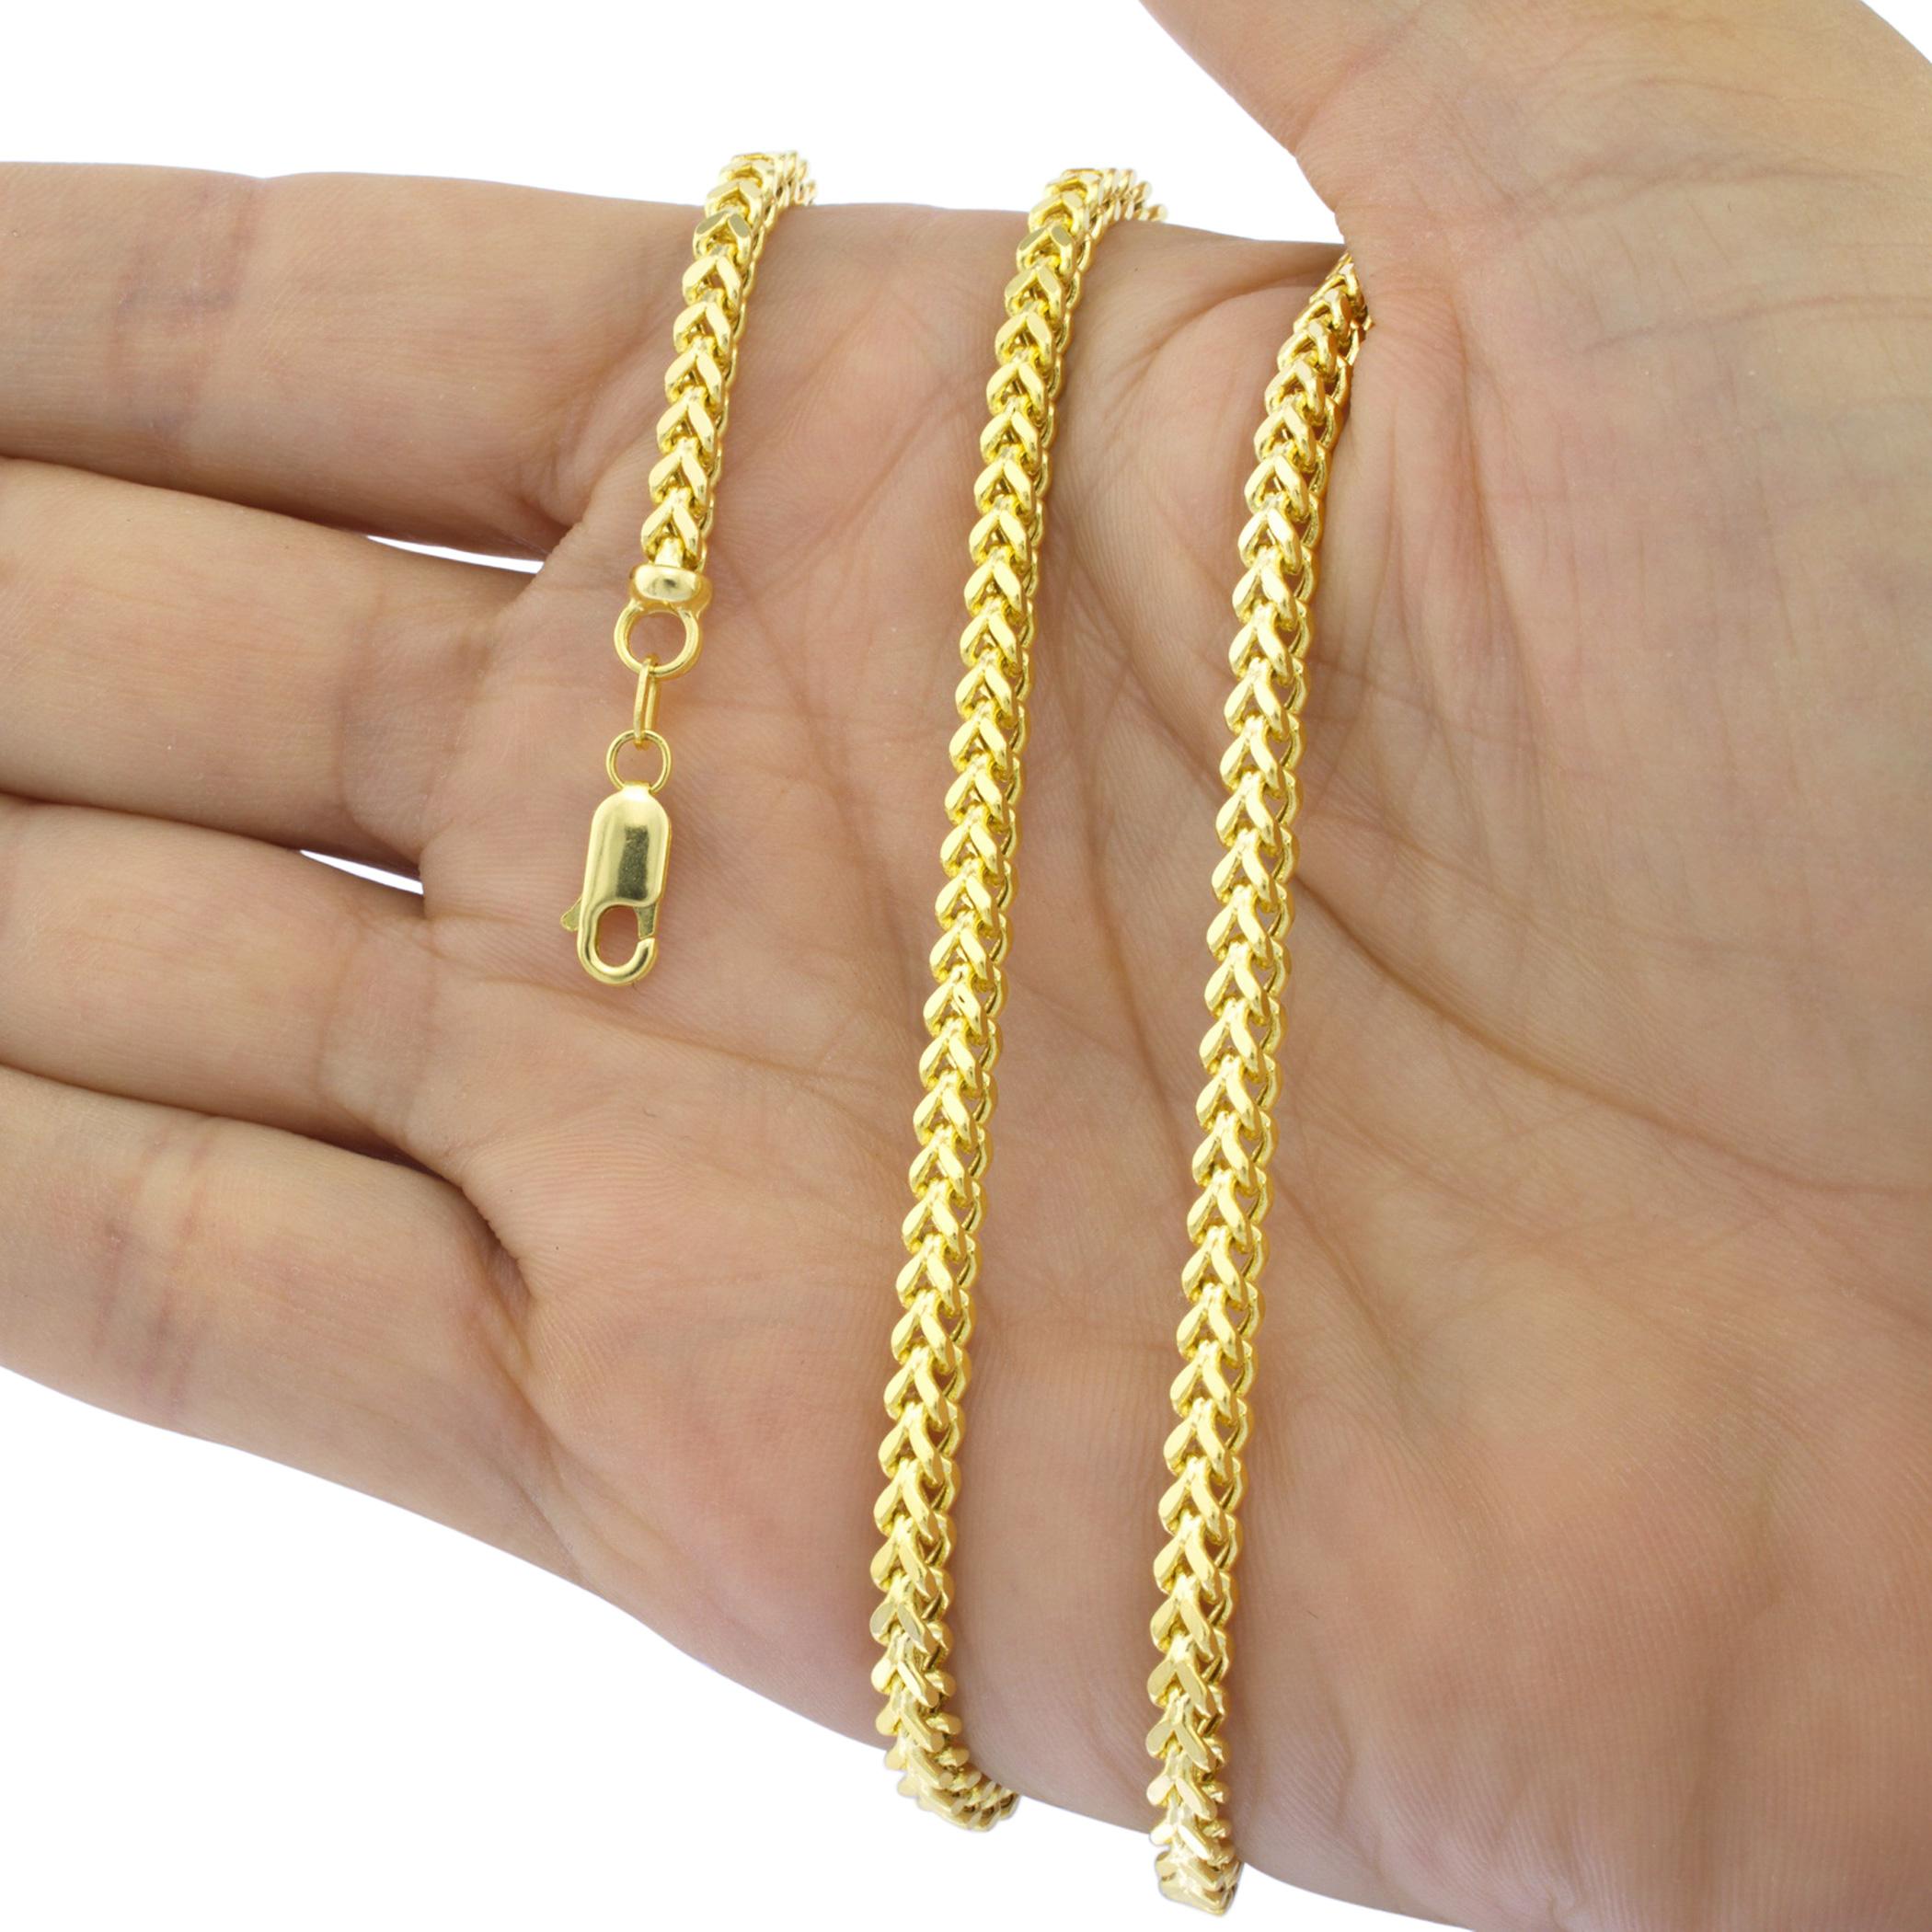 10K Yellow Gold 1.5mm-6mm Square Wheat Box Franco Chain